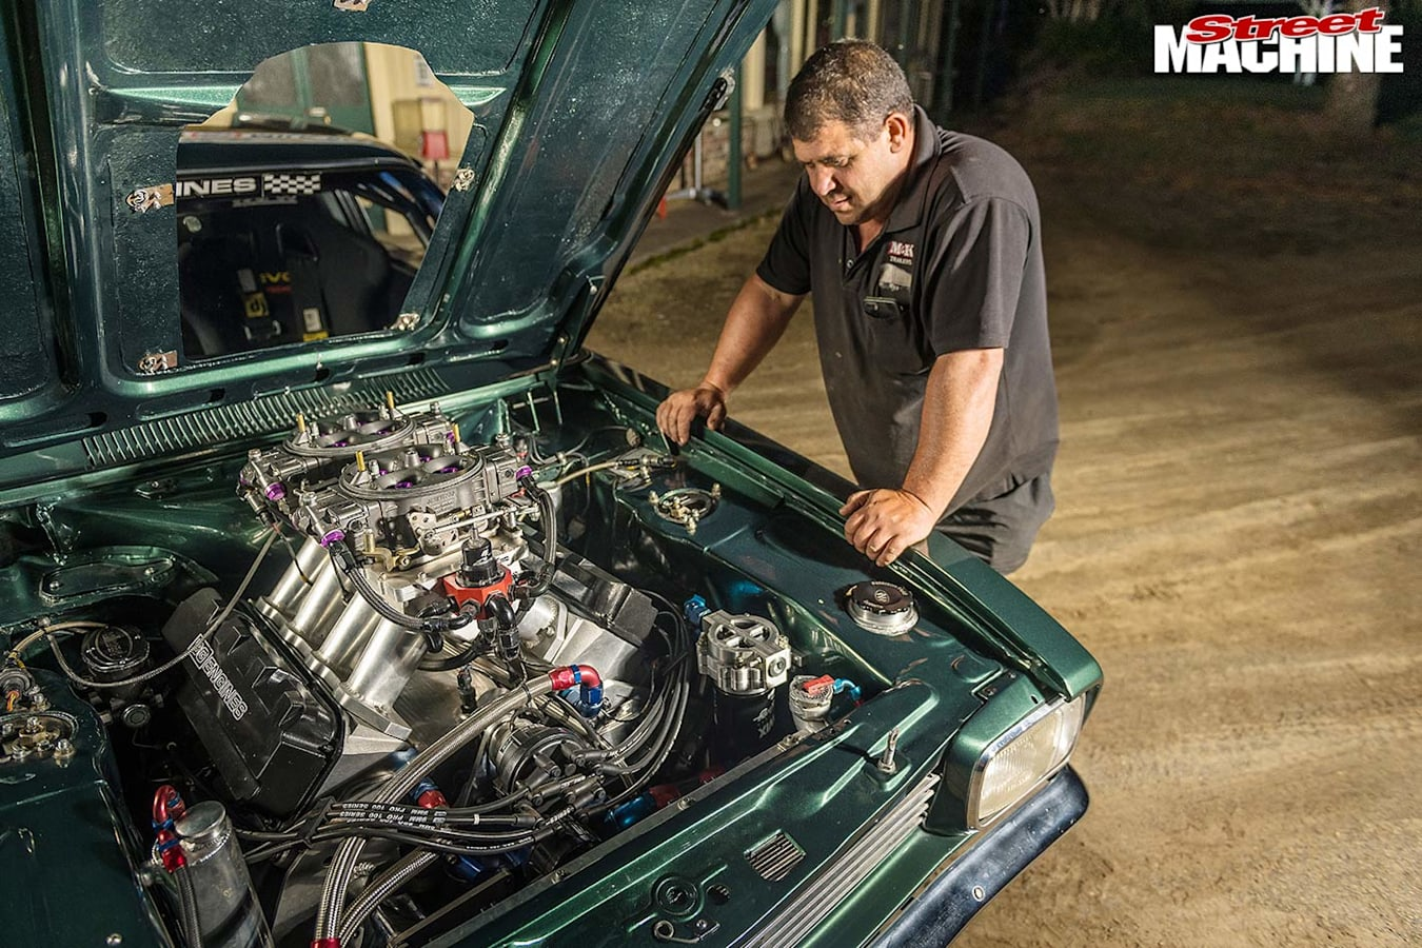 Alon Vella's Ford Capri engine bay